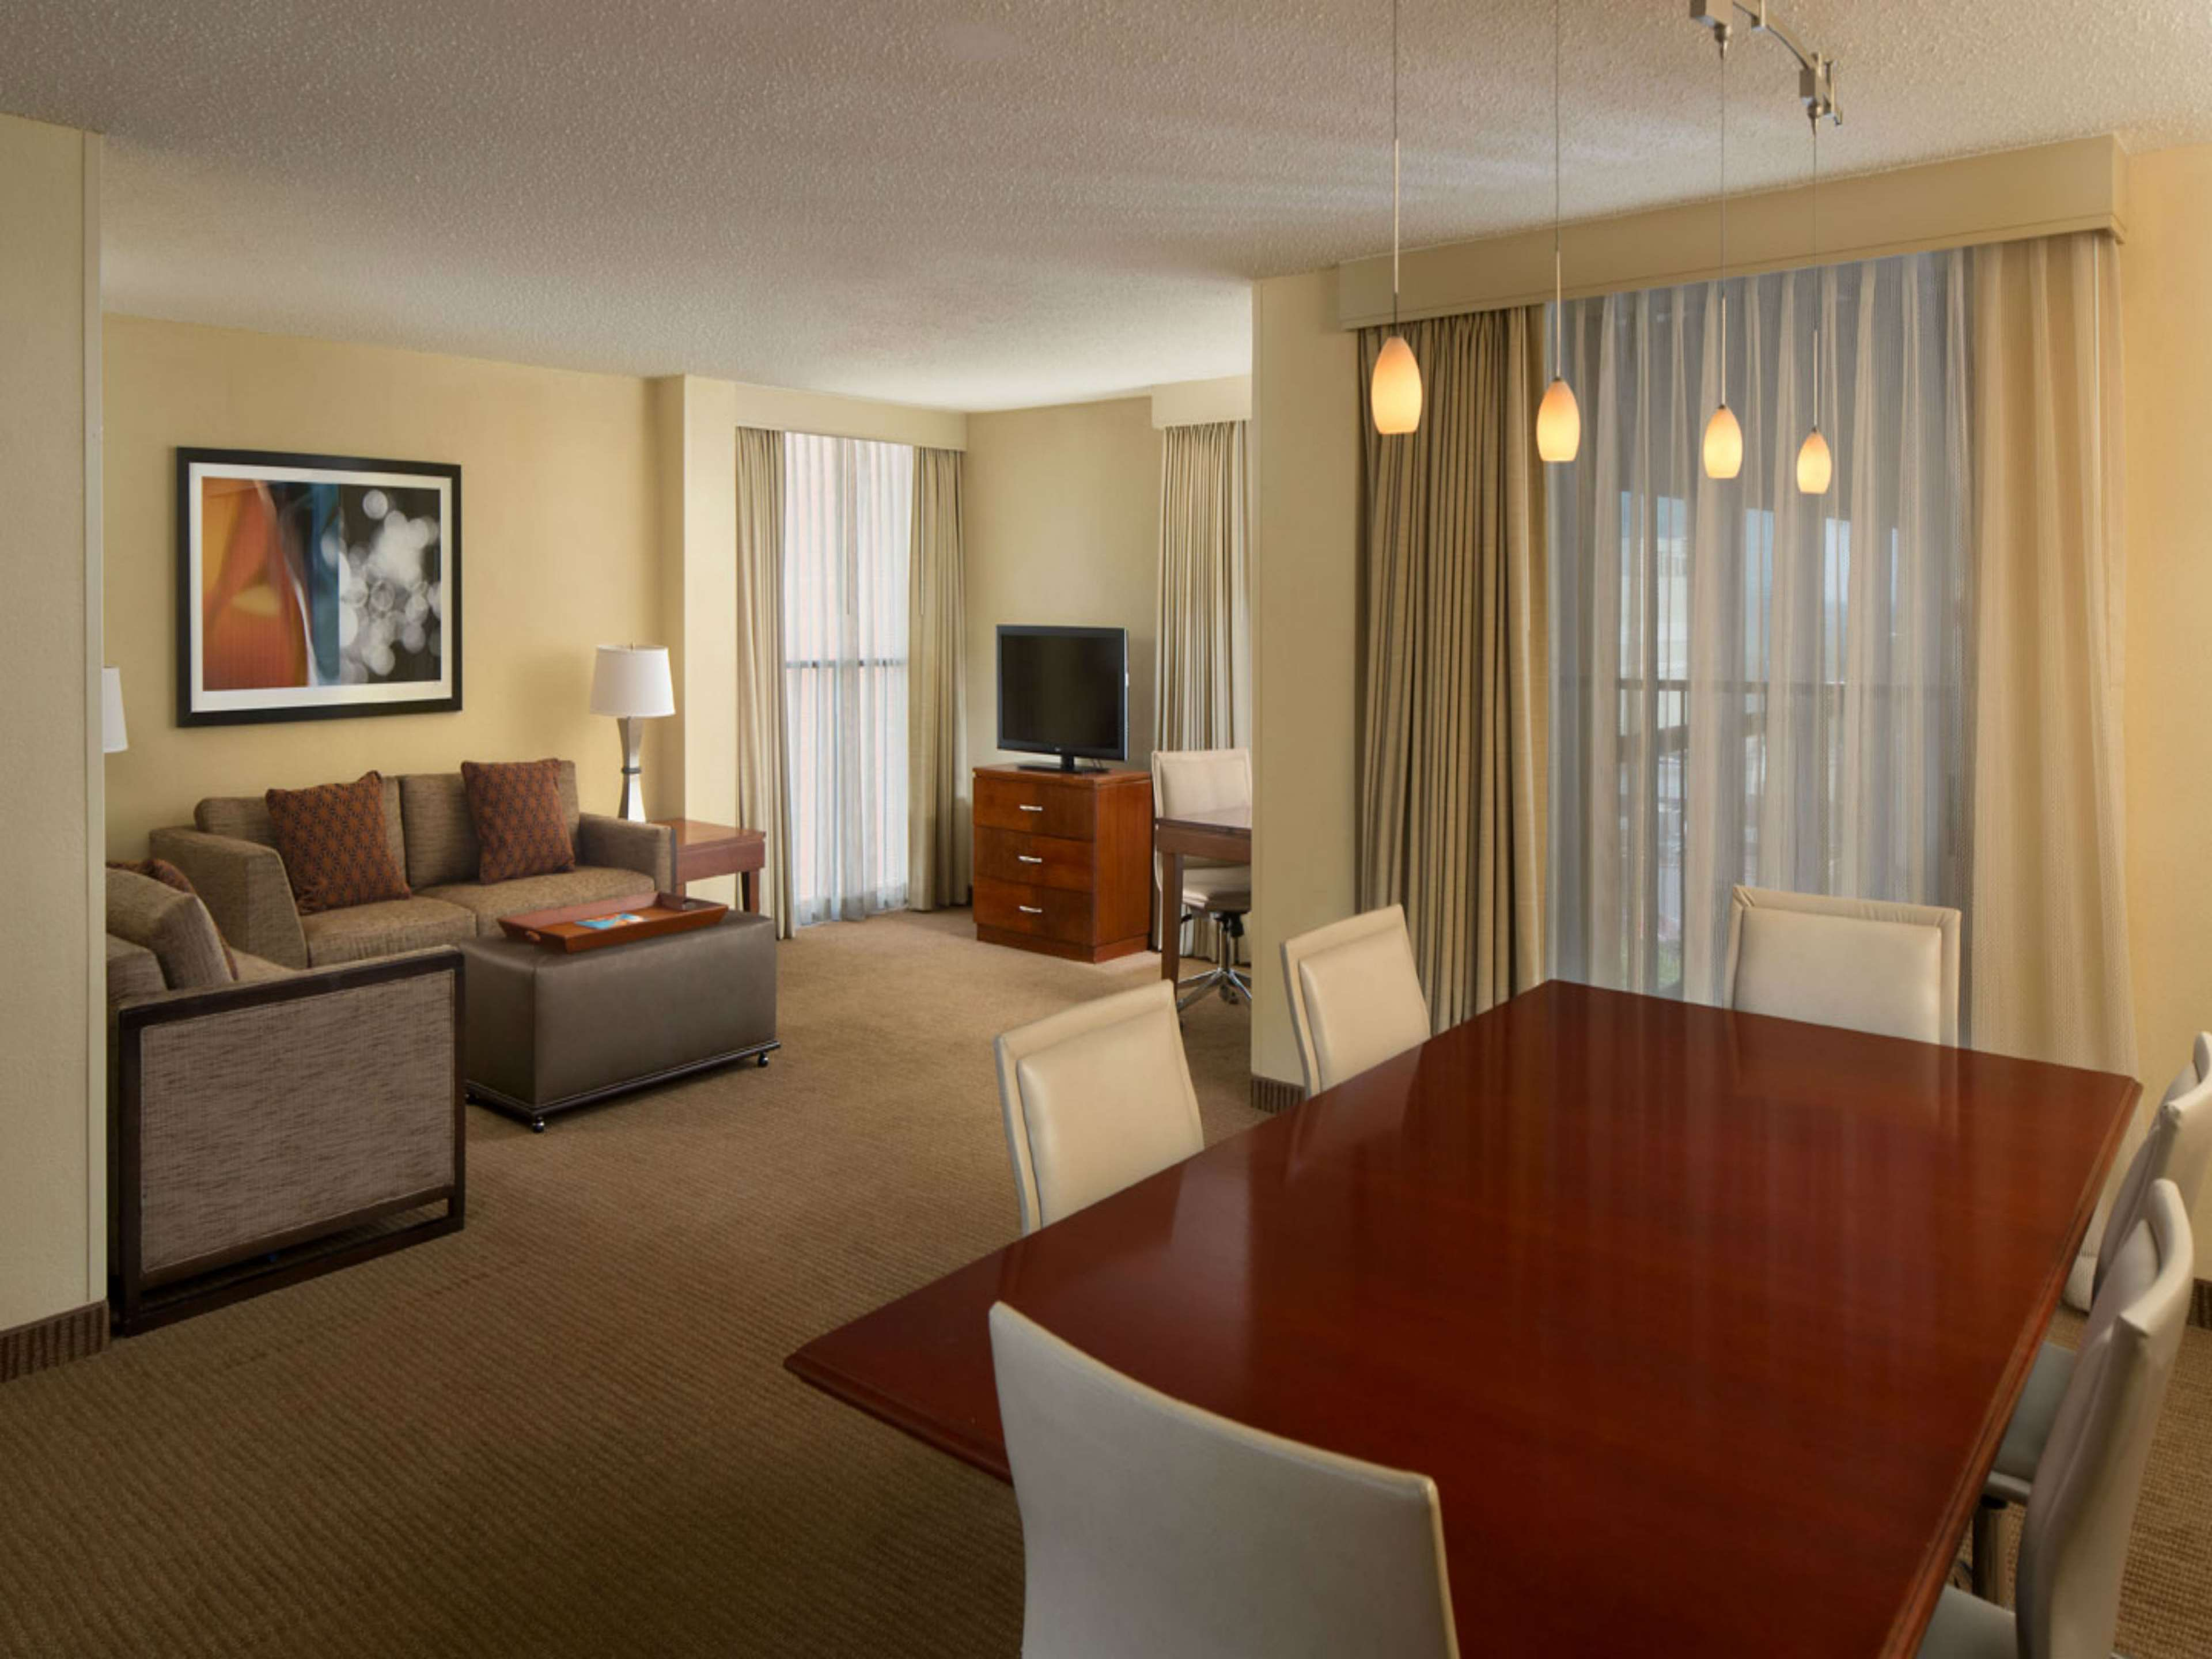 Embassy Suites by Hilton Winston Salem image 14